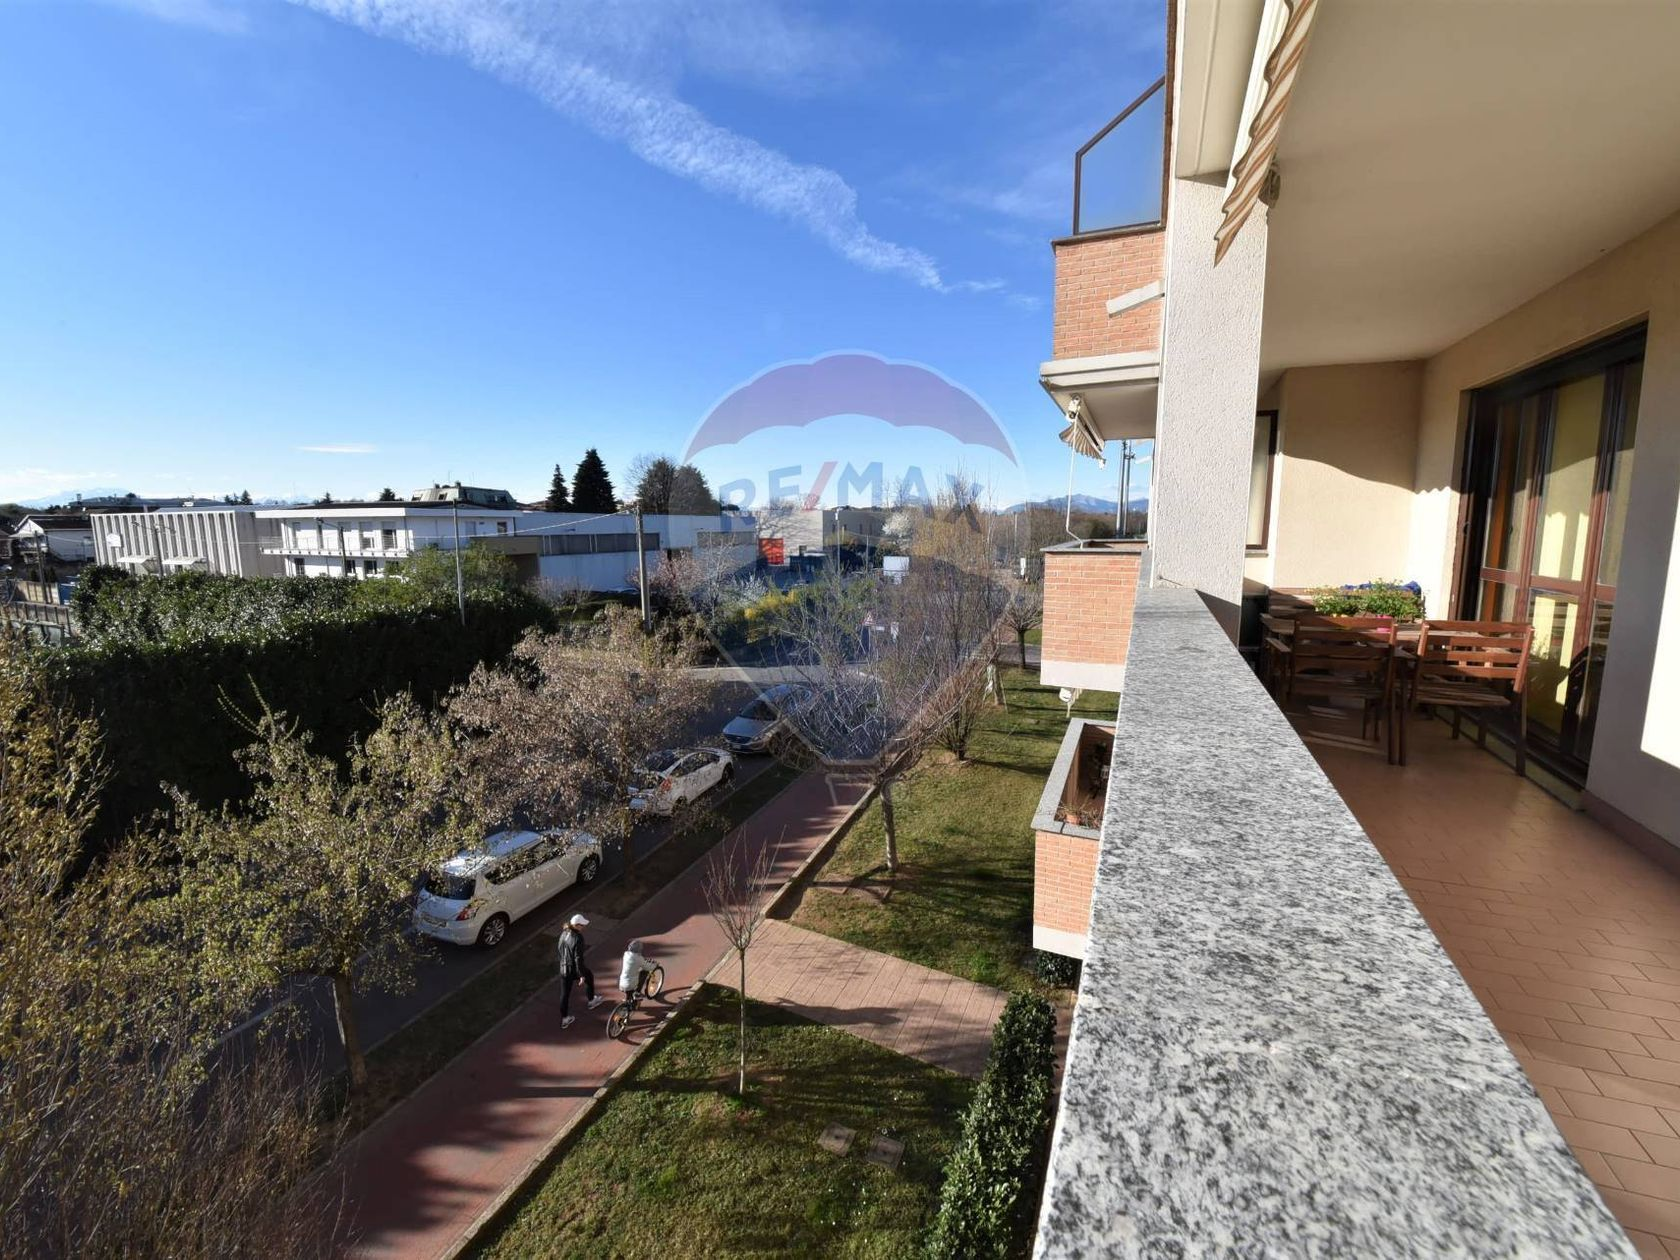 Appartamento Cascina ferrara, Saronno, VA Vendita - Foto 8